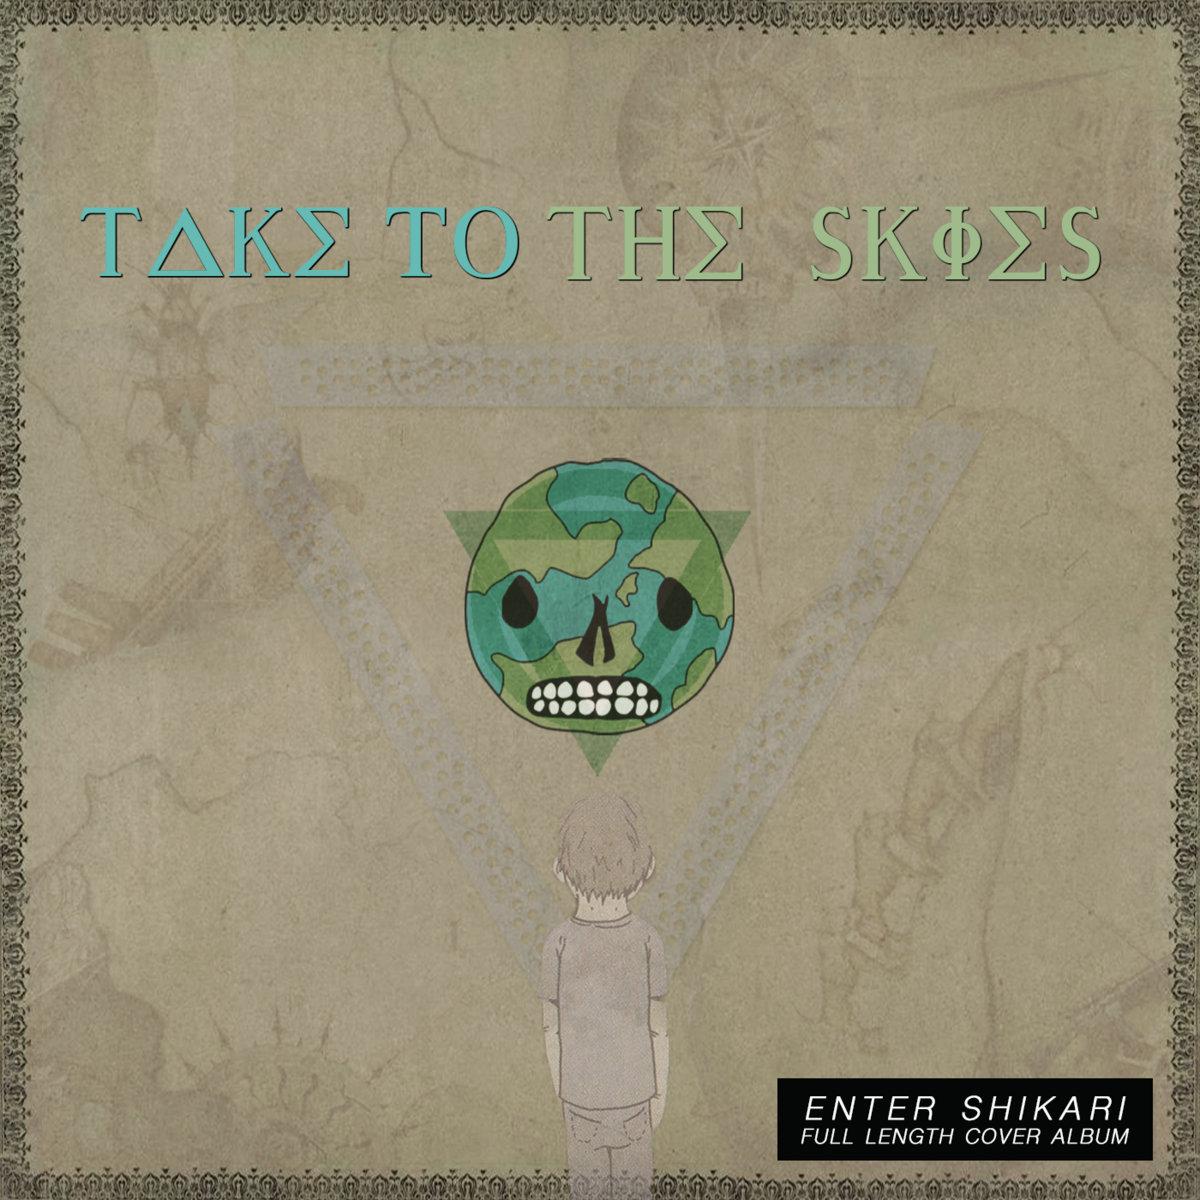 Take to the Skies - Take to the Skies [Enter Shikari cover album] (2017)